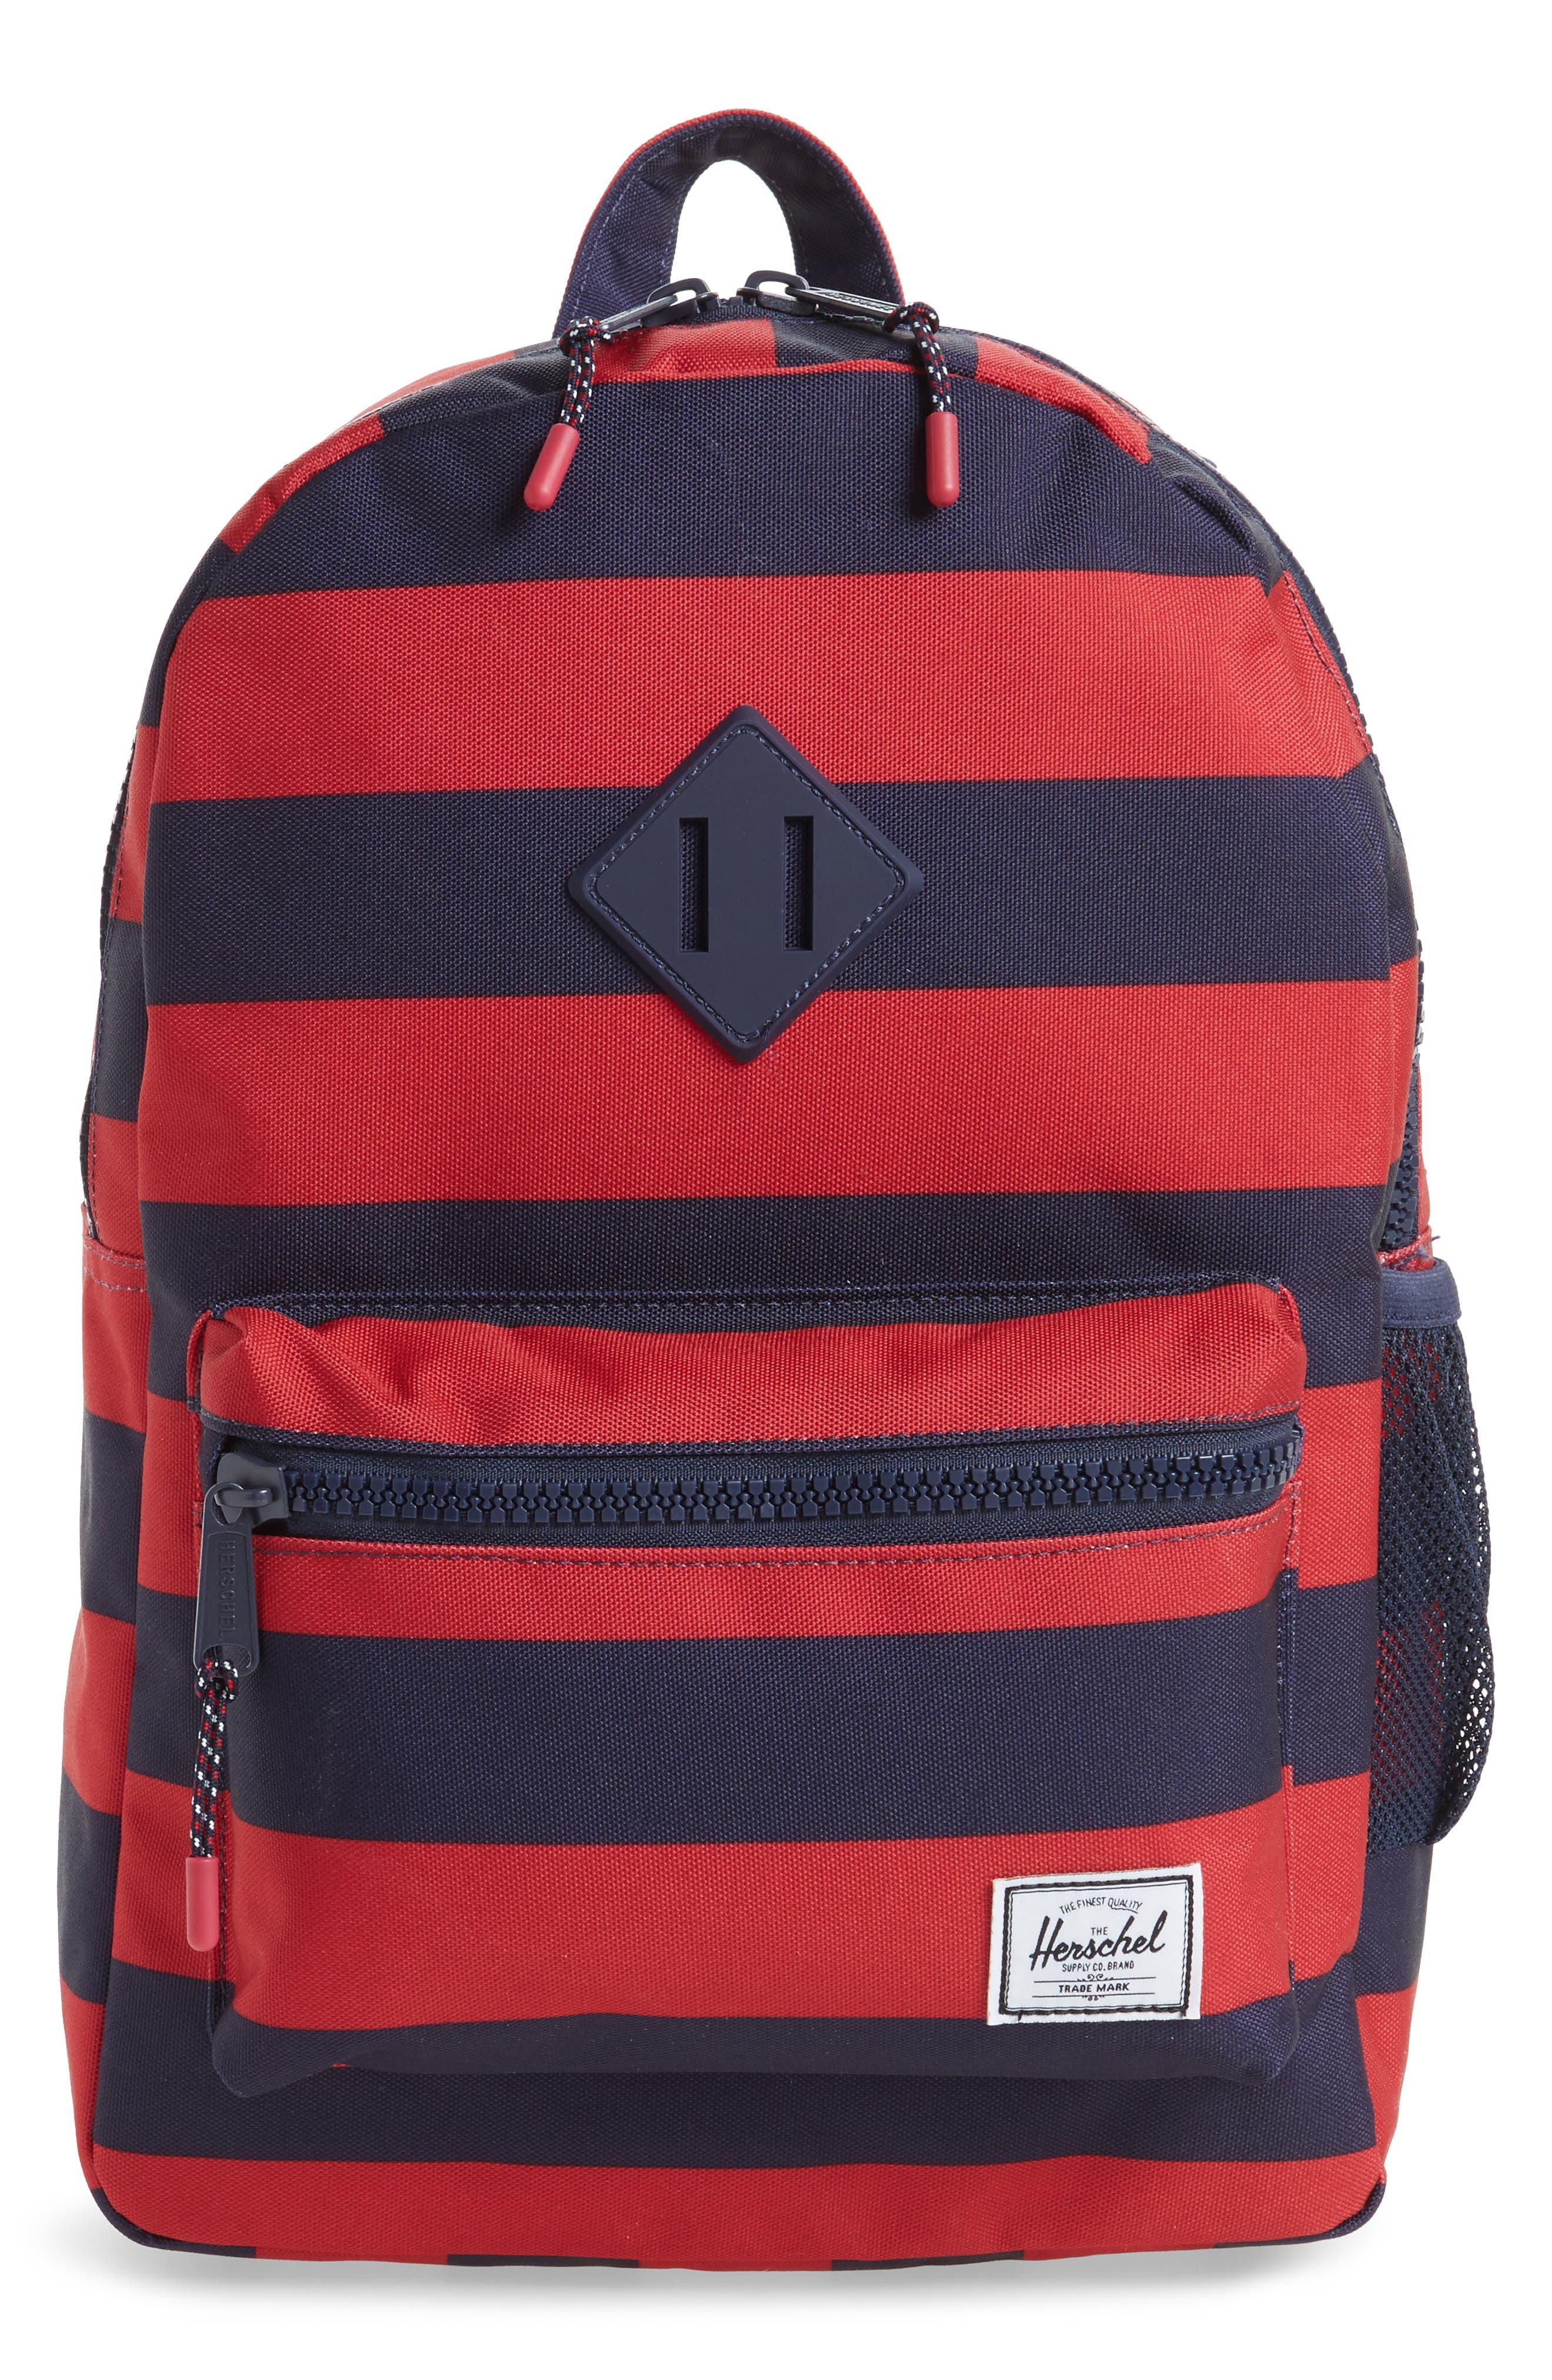 Main Image - Herschel Supply Co. Heritage Stripe Backpack (Kids)